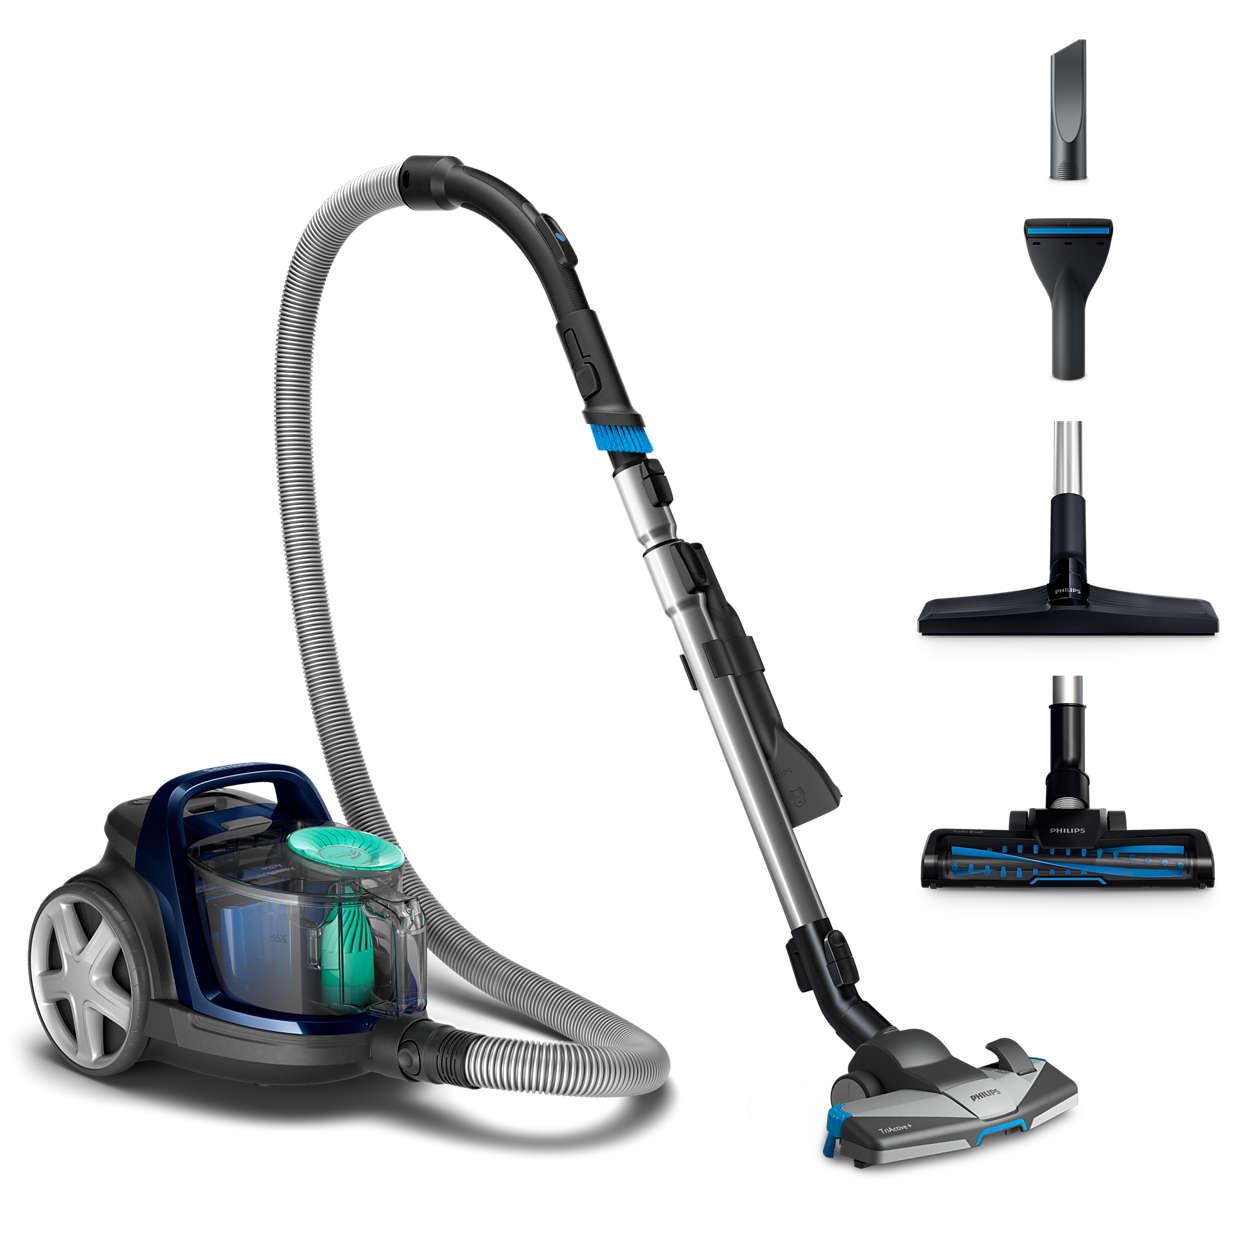 Poseløs støvsuger – grundig rengjøring uten pose   Electrolux